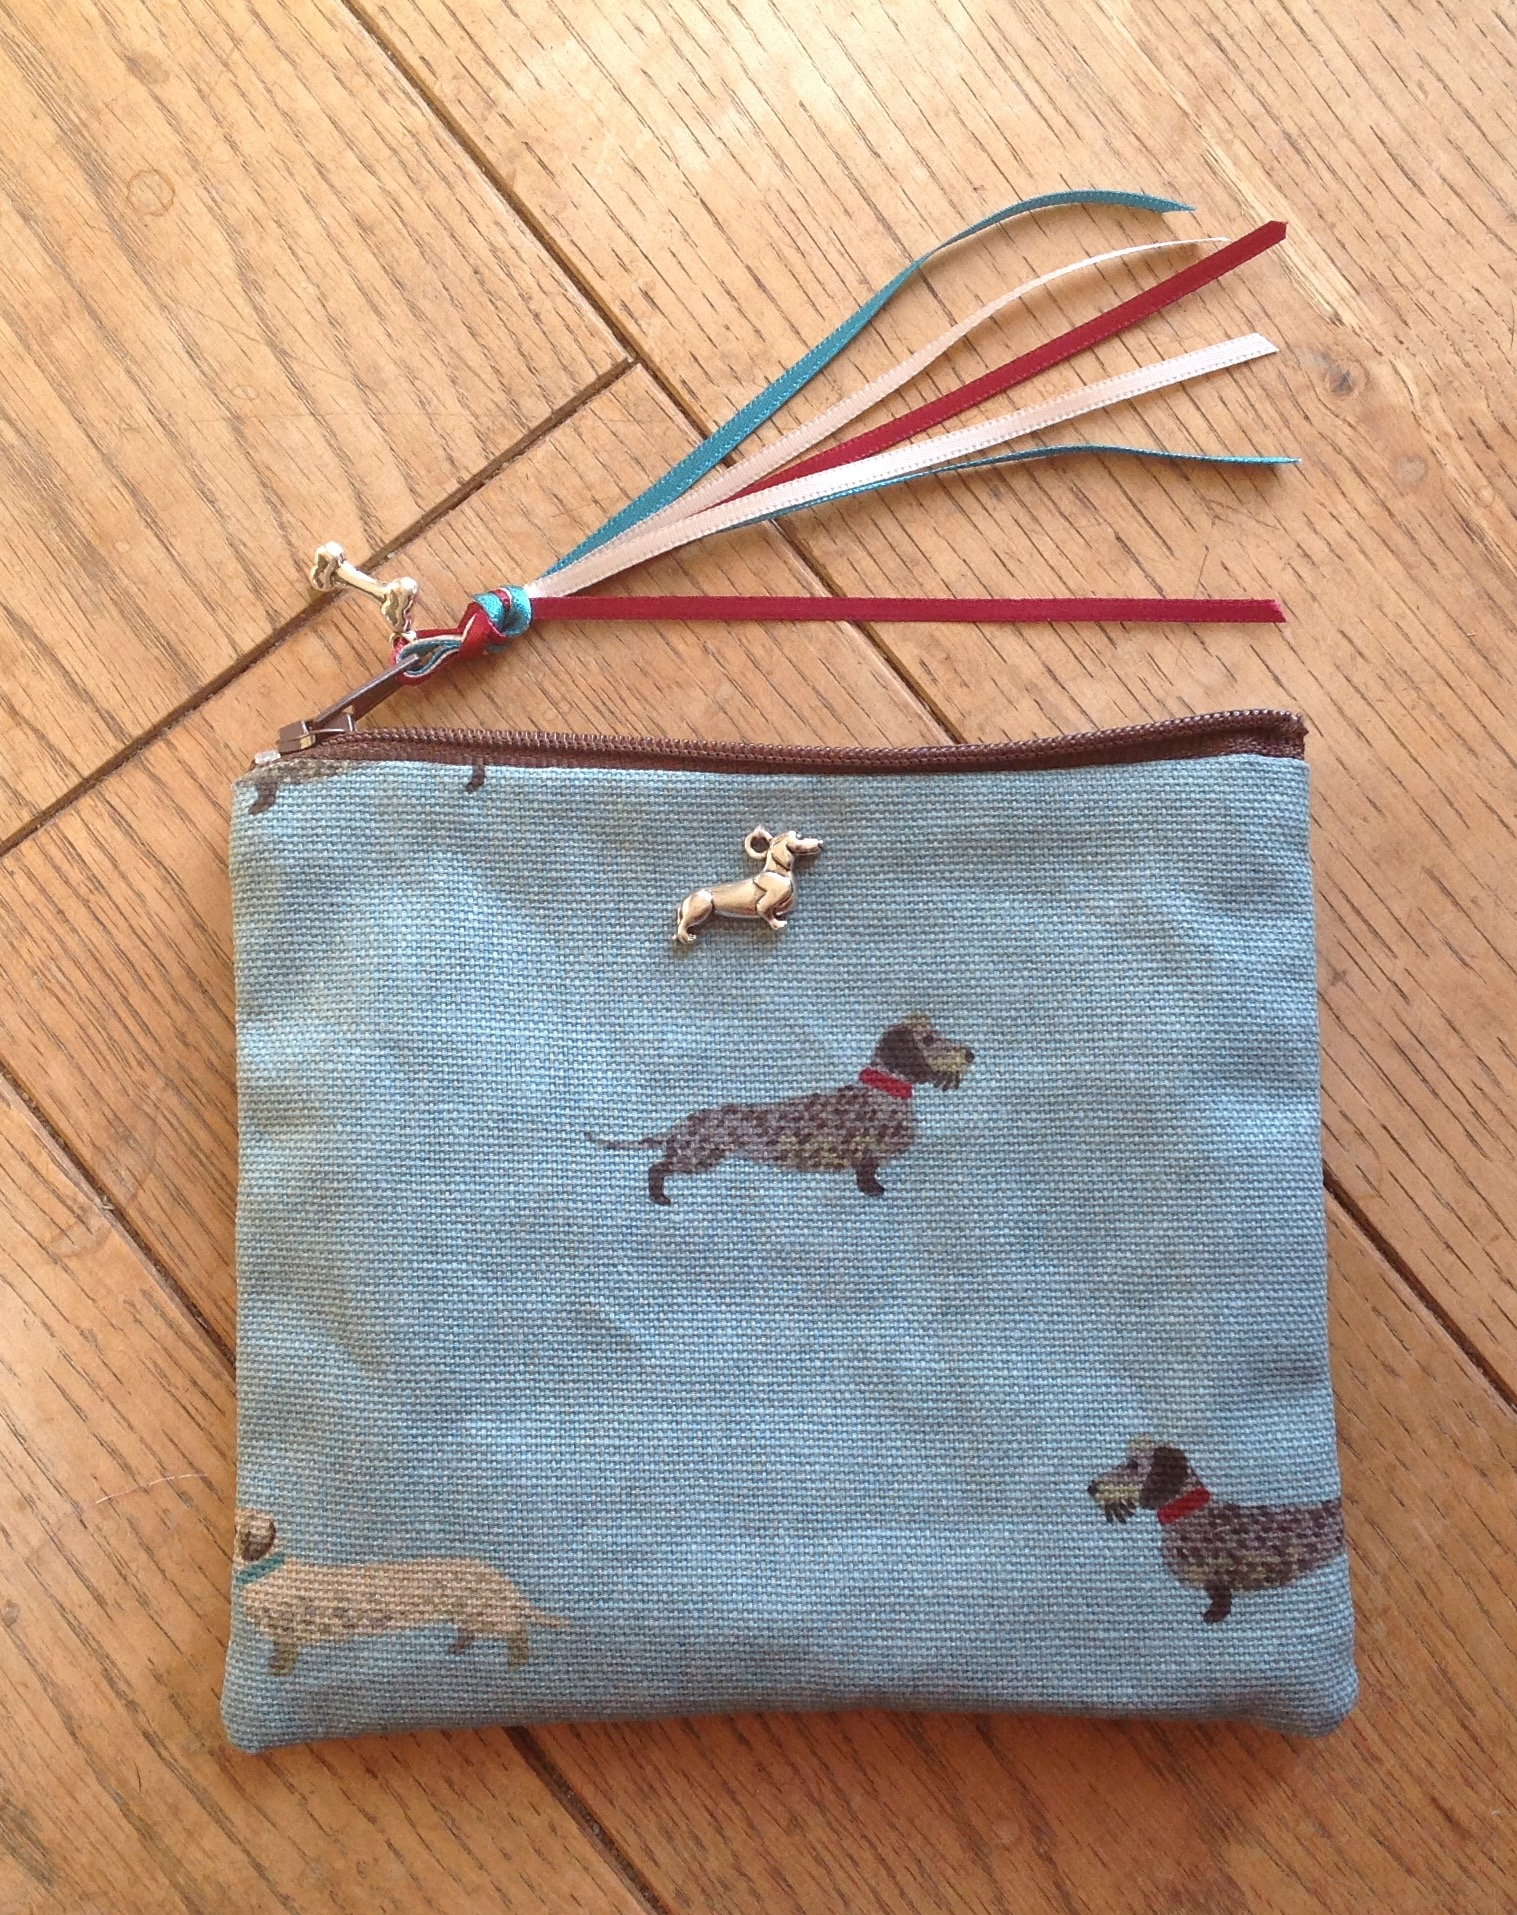 Coin purse - Sophie Allport WH daschunds design